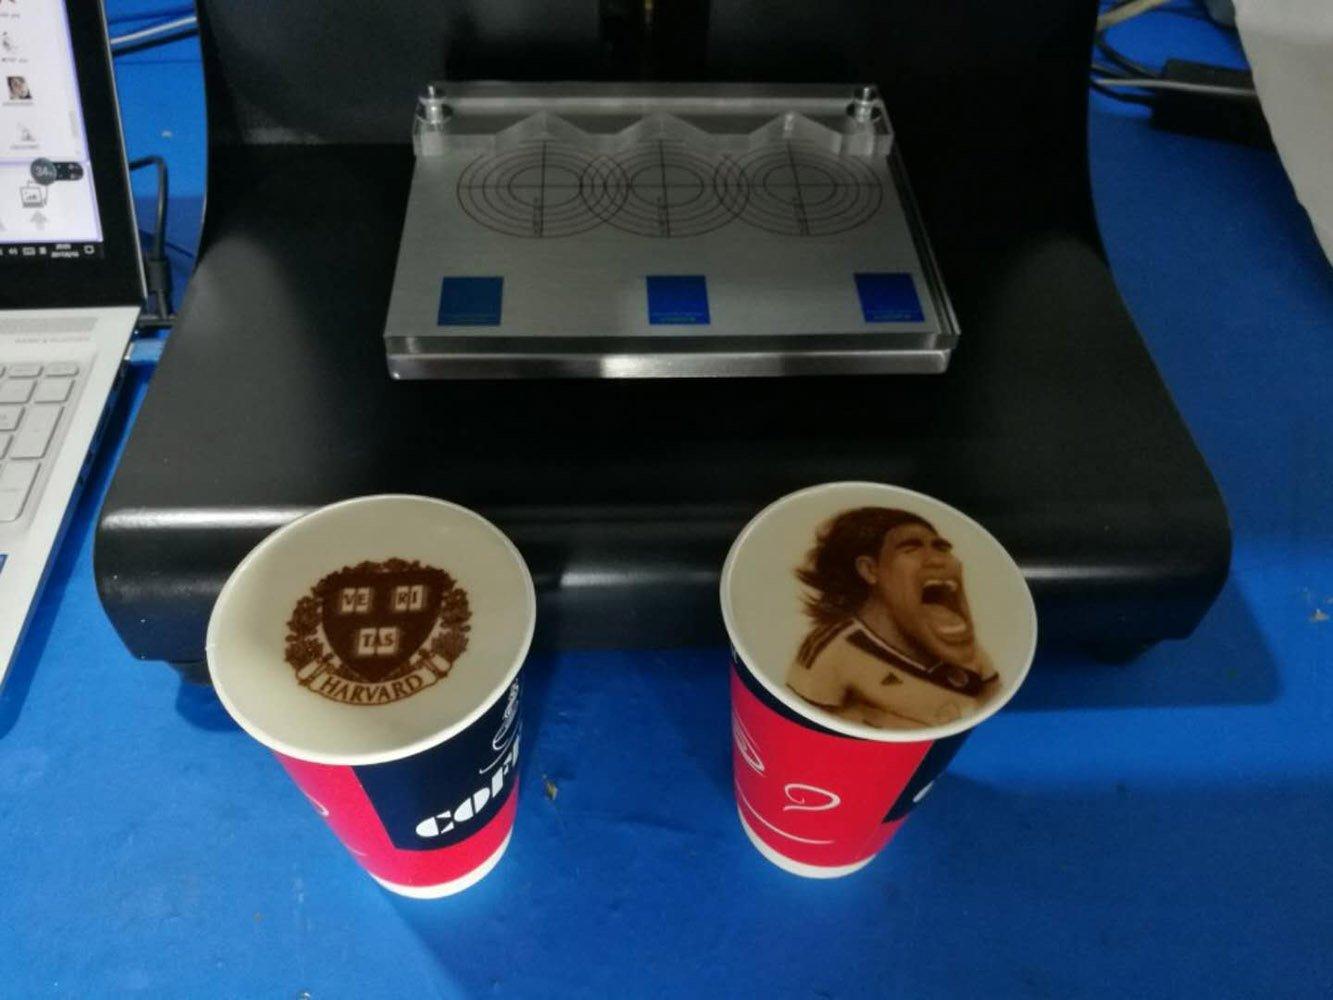 Impresora Mokka 3D Coffee, 2018 Upgrade 4 Tazas Latte Cake Selfie Impresora Artística Full Tinta Comestible automática Printe (Marrón): Amazon.es: Hogar